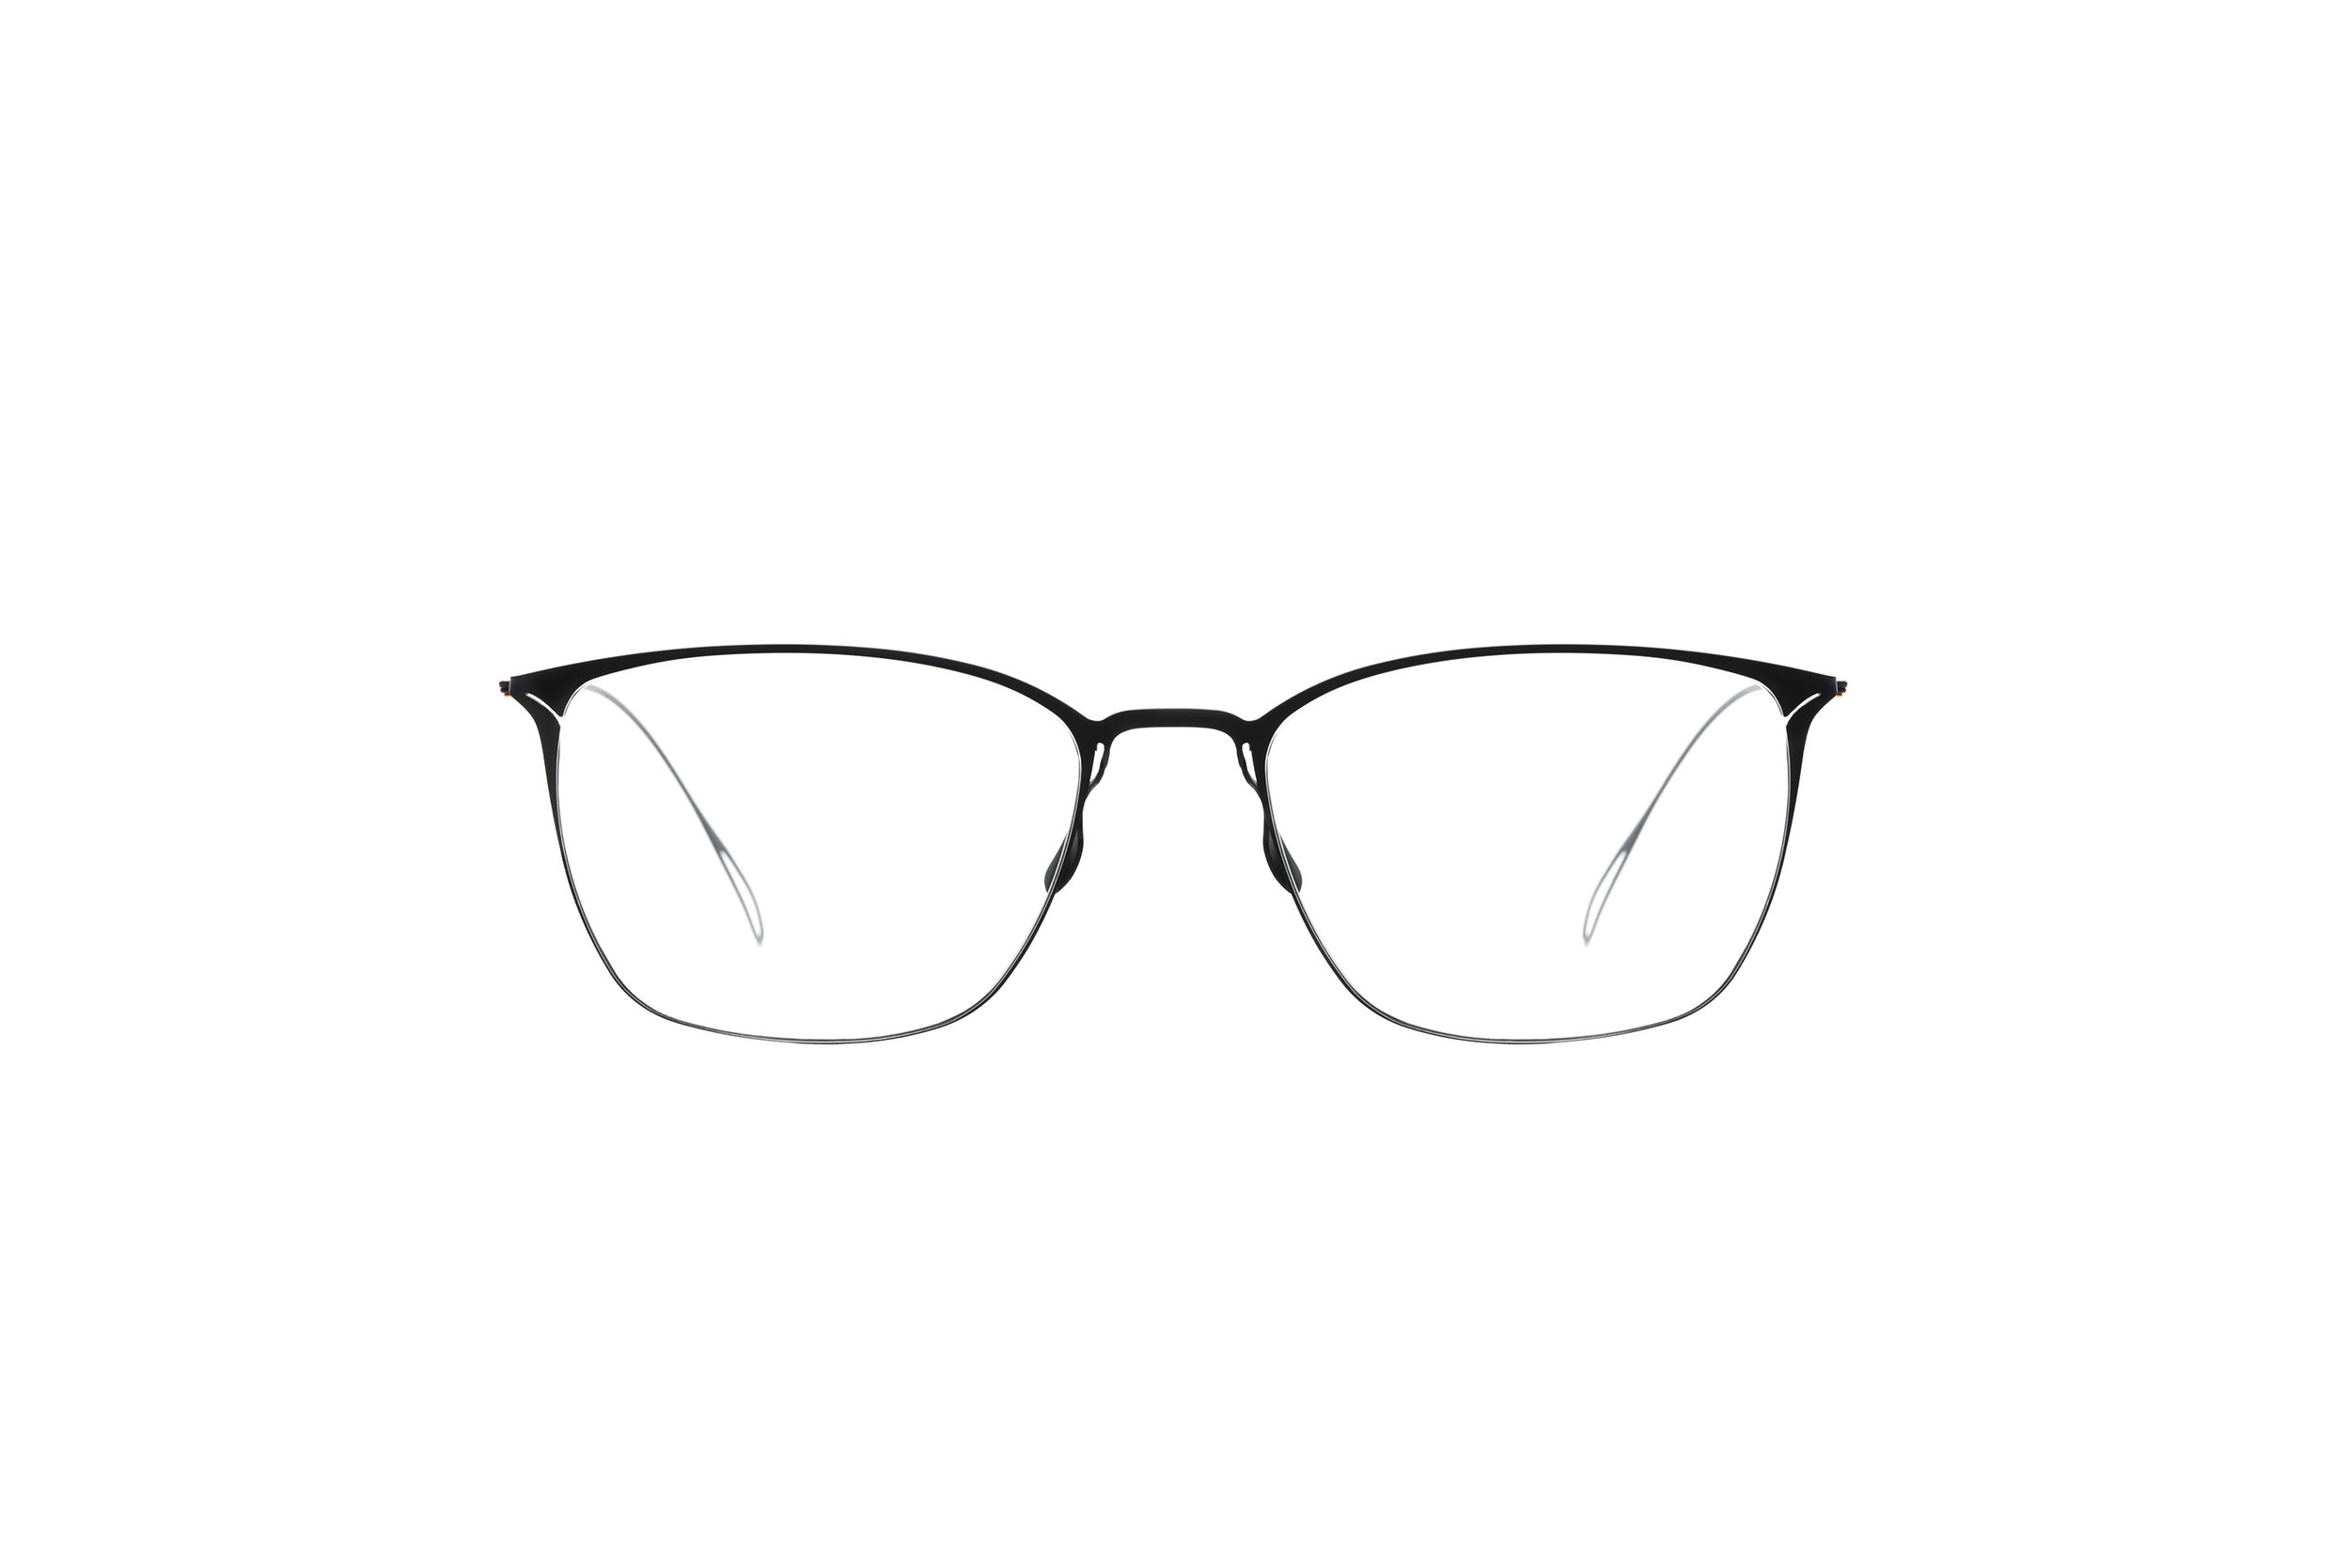 haffmans_neumeister_hayes_black_clear_ultralight_eyeglasses_front_102453.jpg